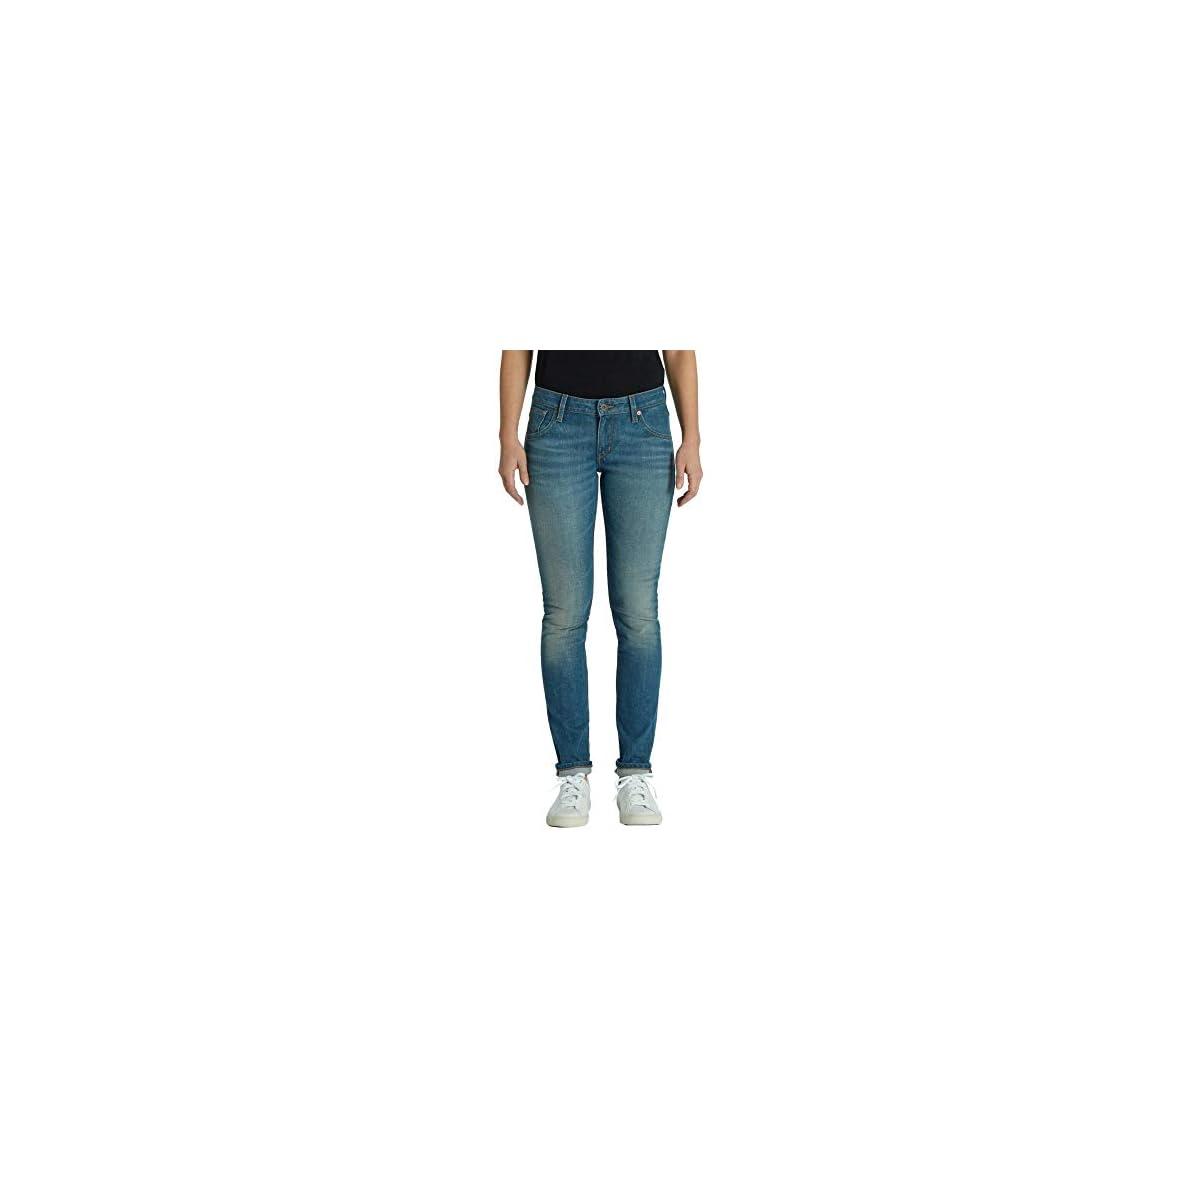 Kuyichi Damen Jeans Lisa Slim Bio-Baumwolle Authentic-Blue